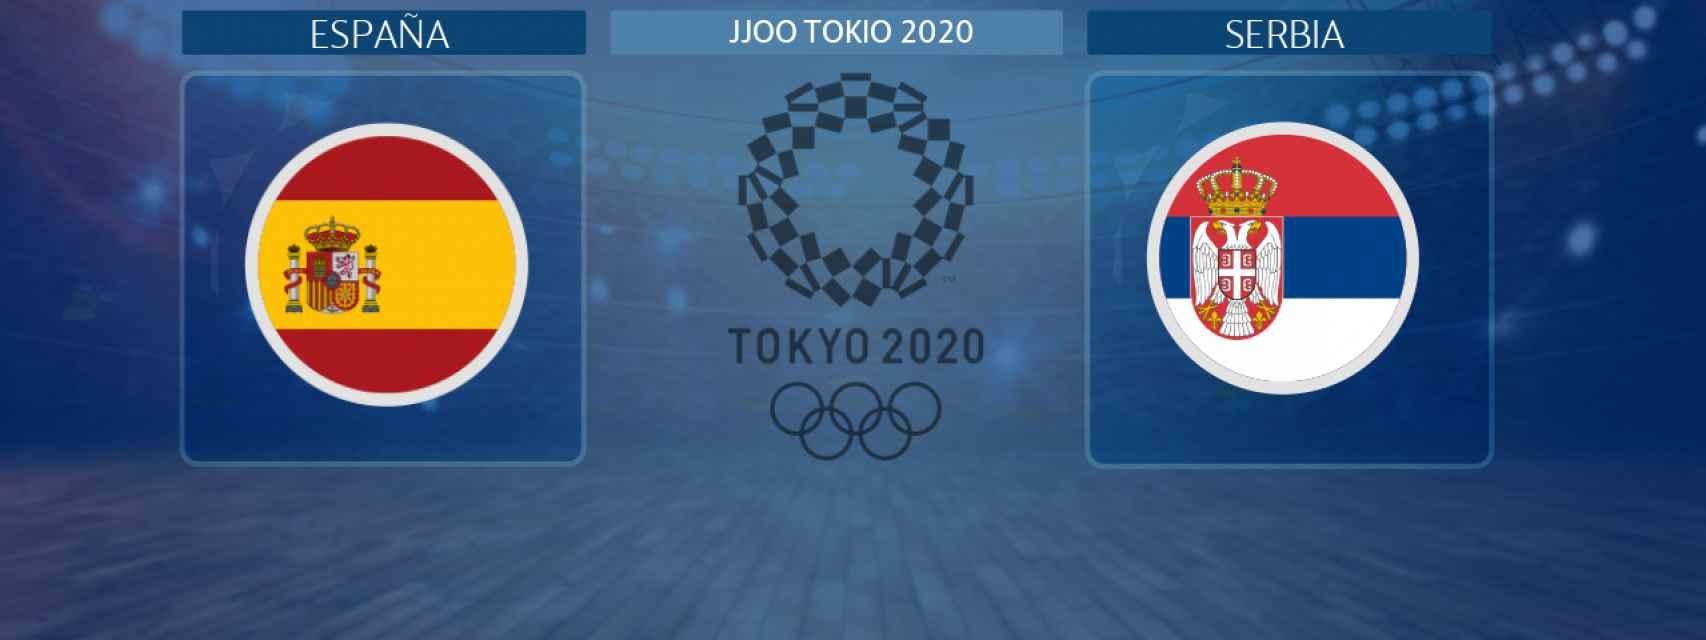 España - Serbia, partido de baloncesto femenino de los JJOO Tokio 2020